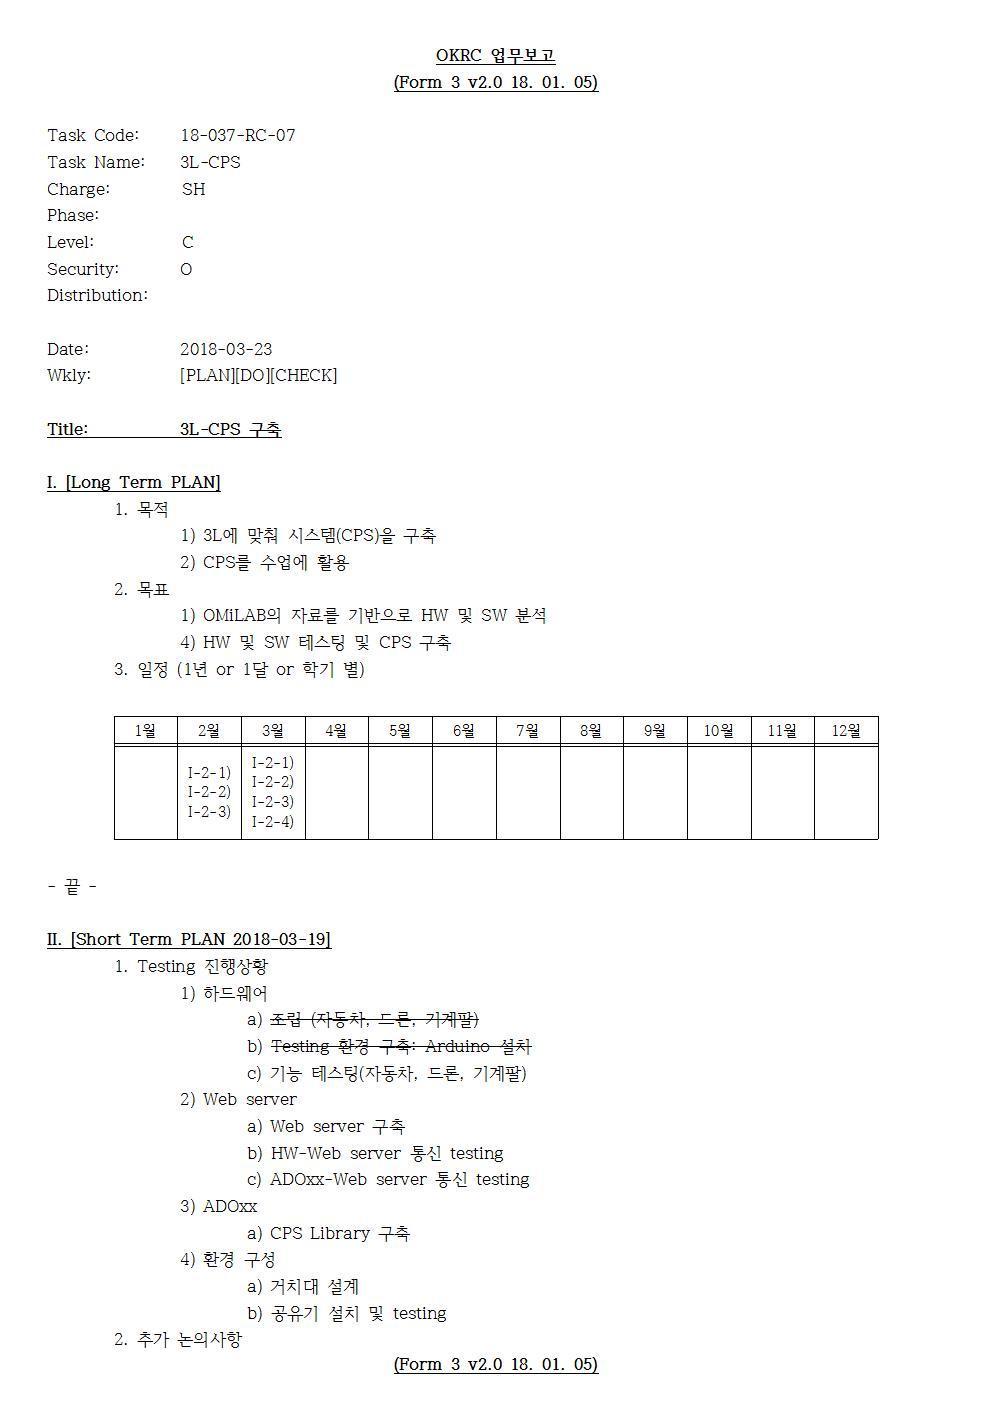 D-[18-037-RC-07]-[3L-CPS]-[2018-03-23][SH]001.jpg